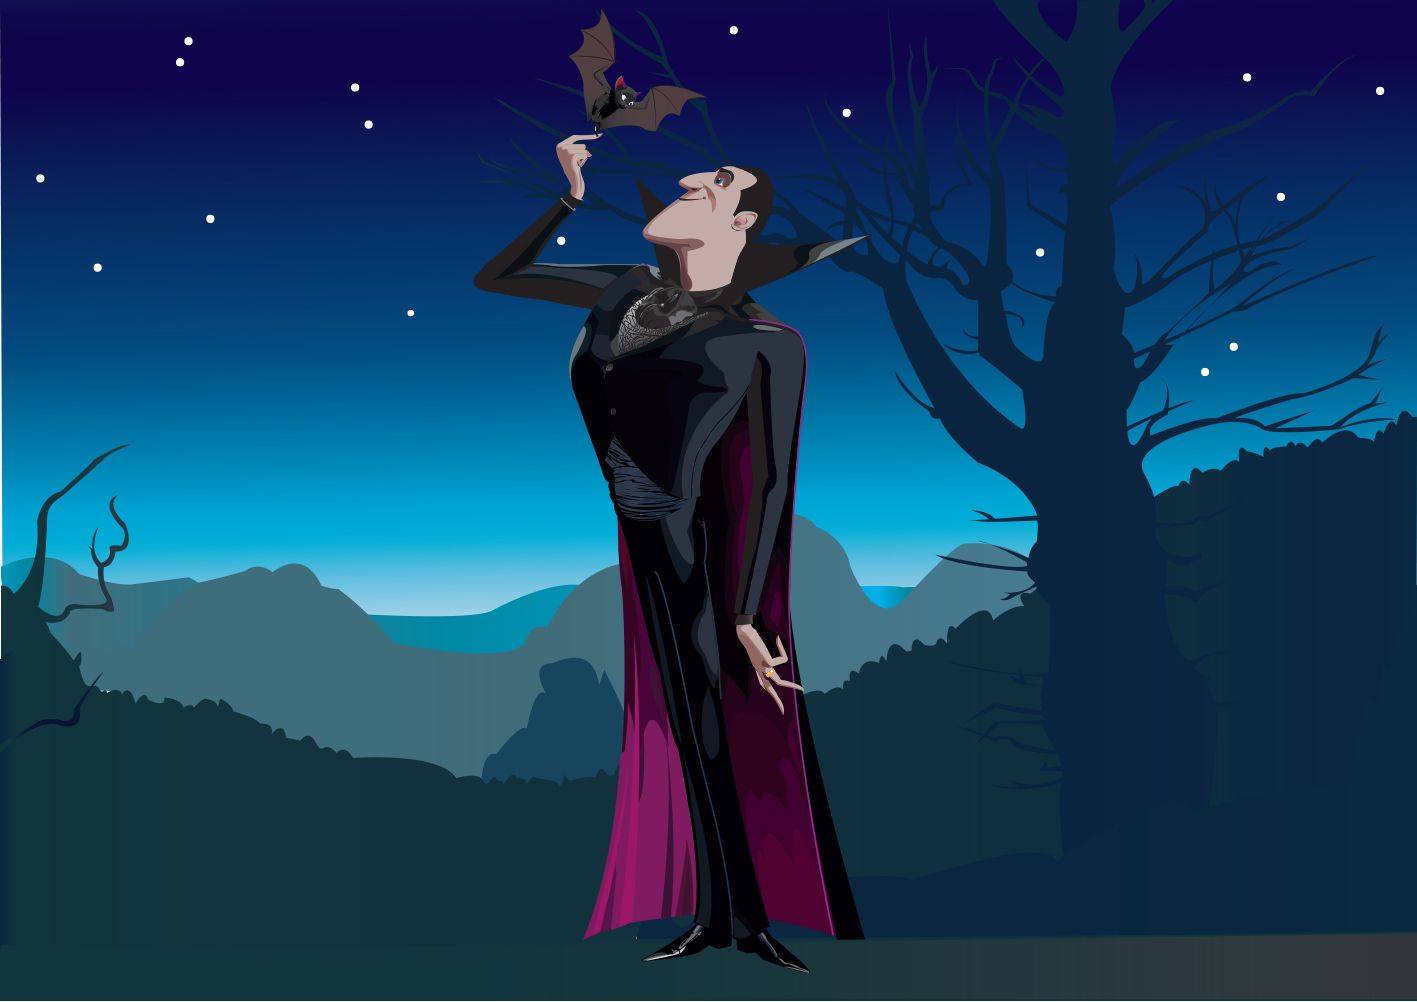 Dracula Dans Hotel Transylvania - Dessin Vectoriel